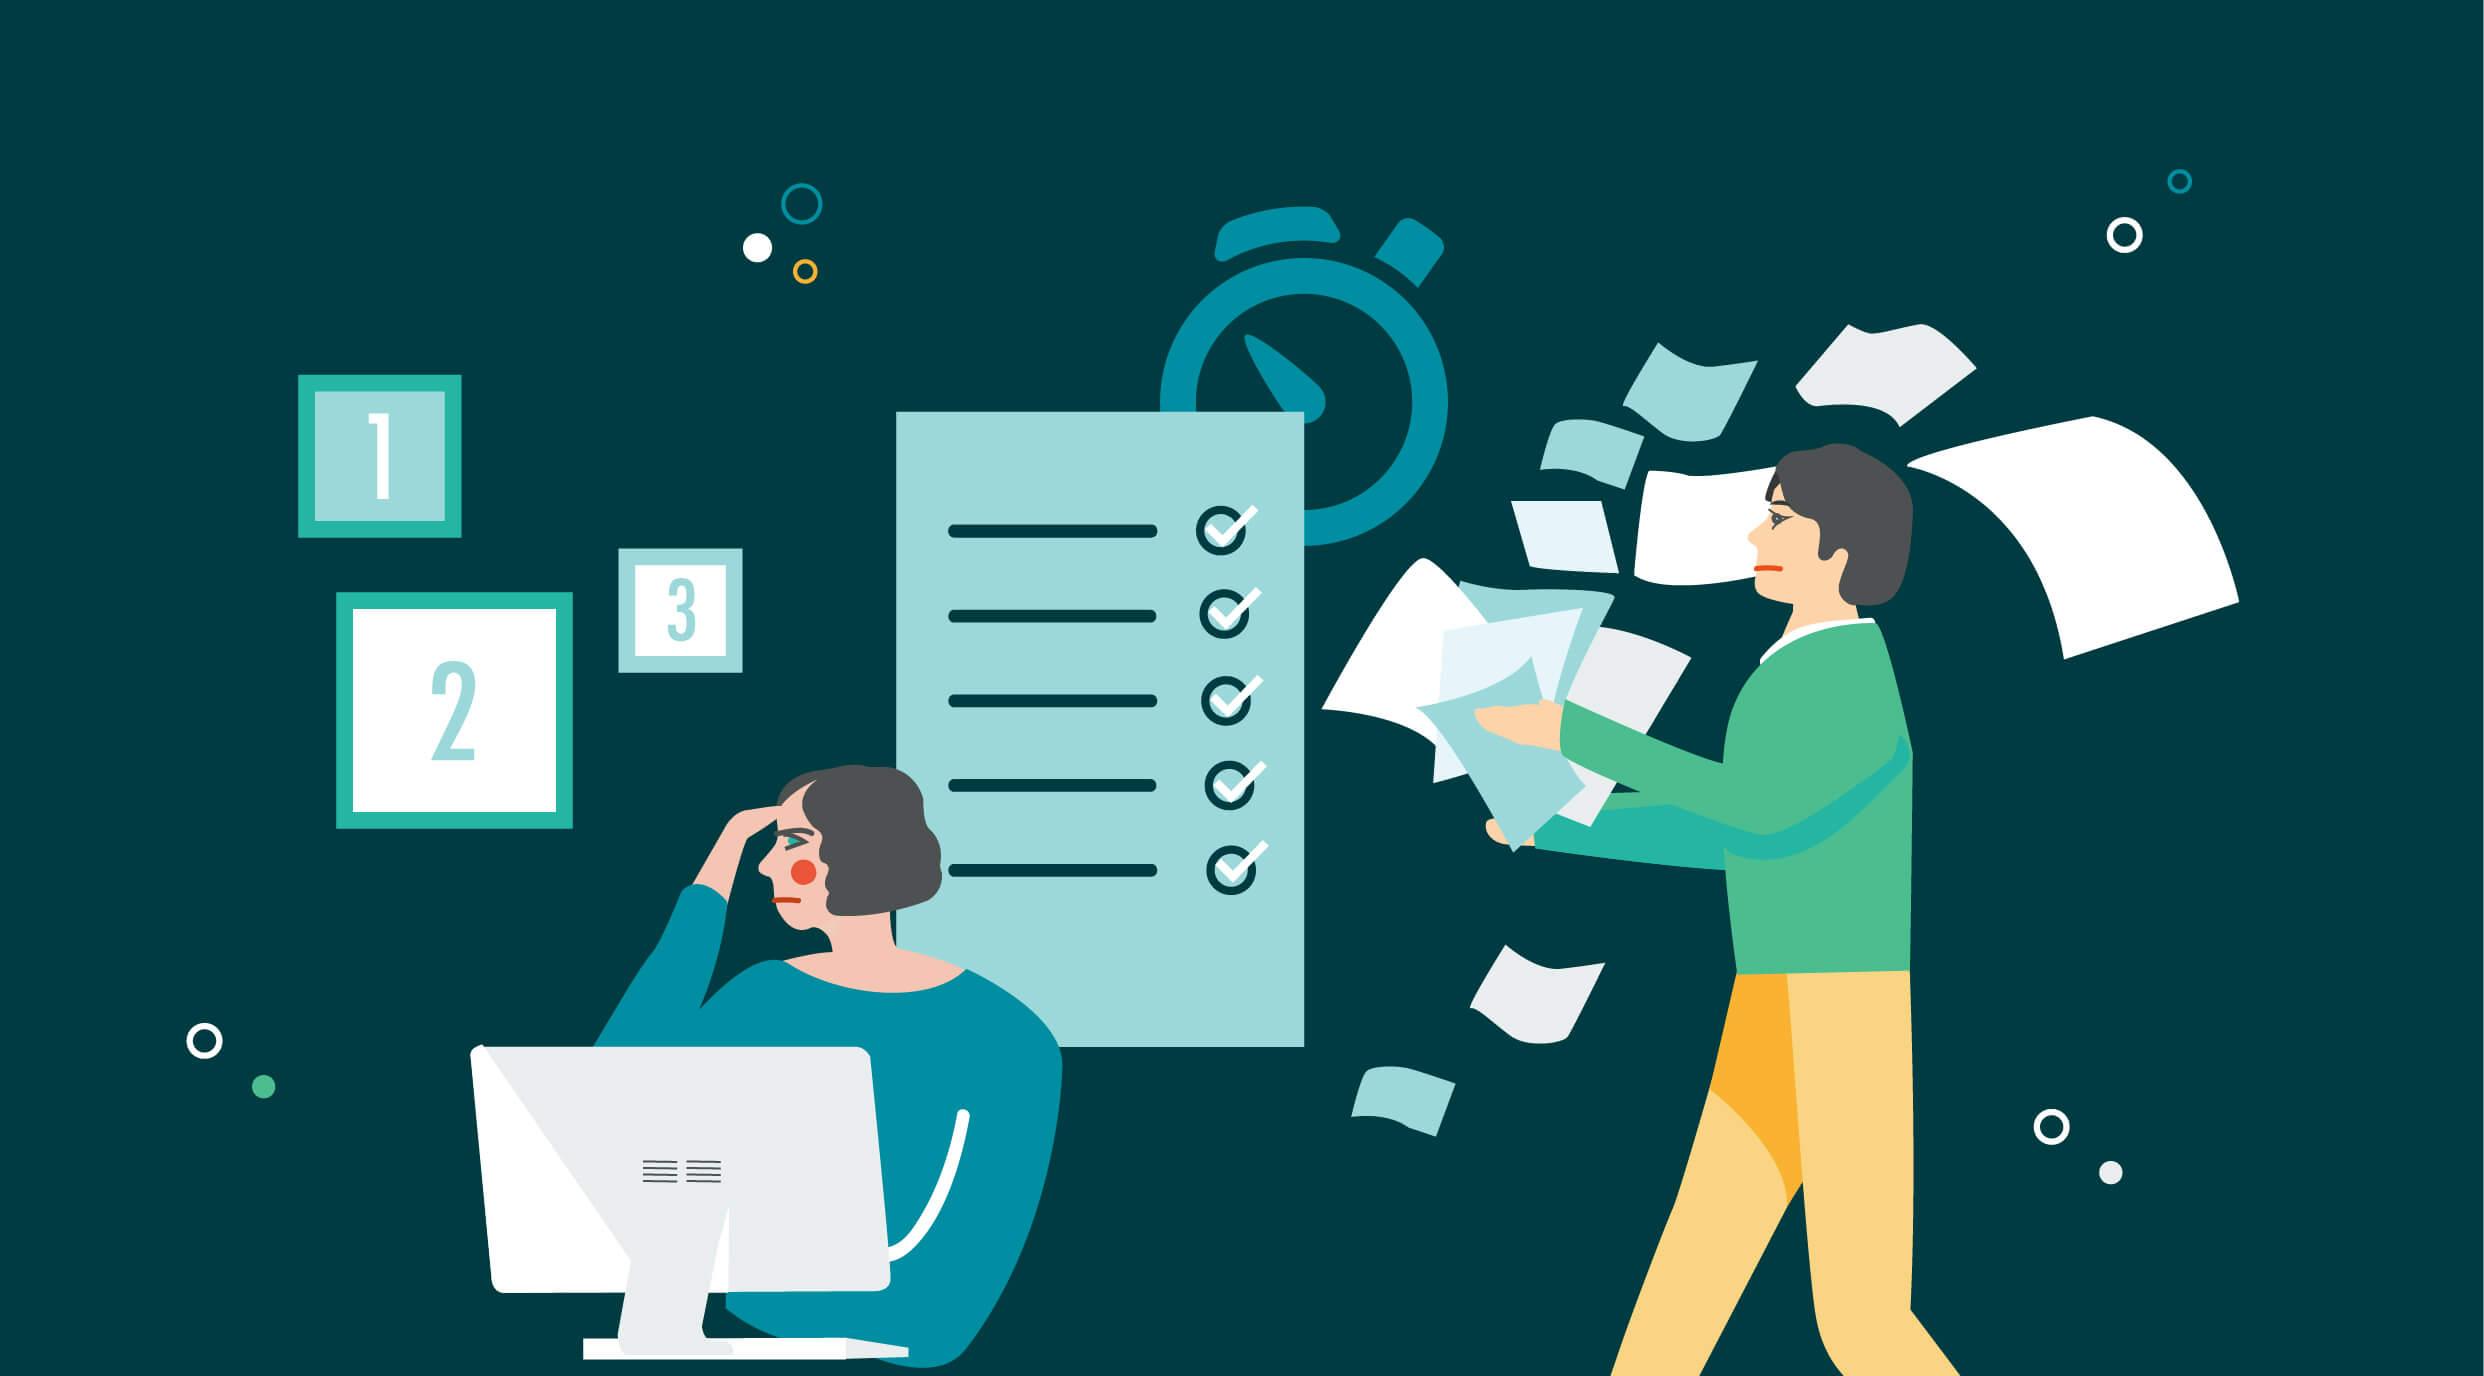 hiring-managers-recruiters-post-resume-vipul-mali-job-consultancy-ahmedabad-gujarat-india